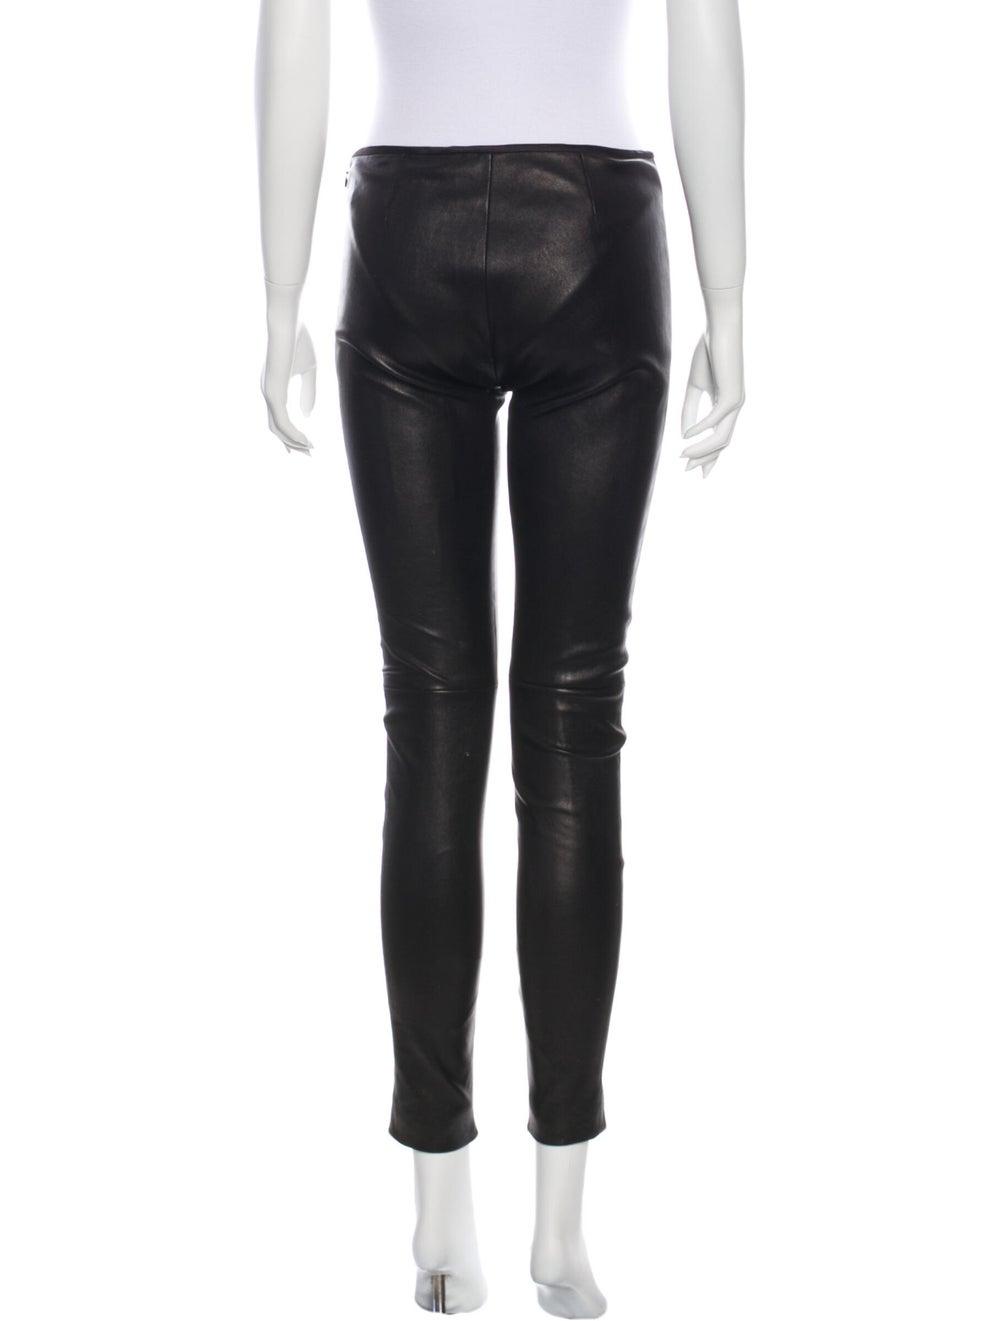 Prada Leather Skinny Leg Pants Black - image 3